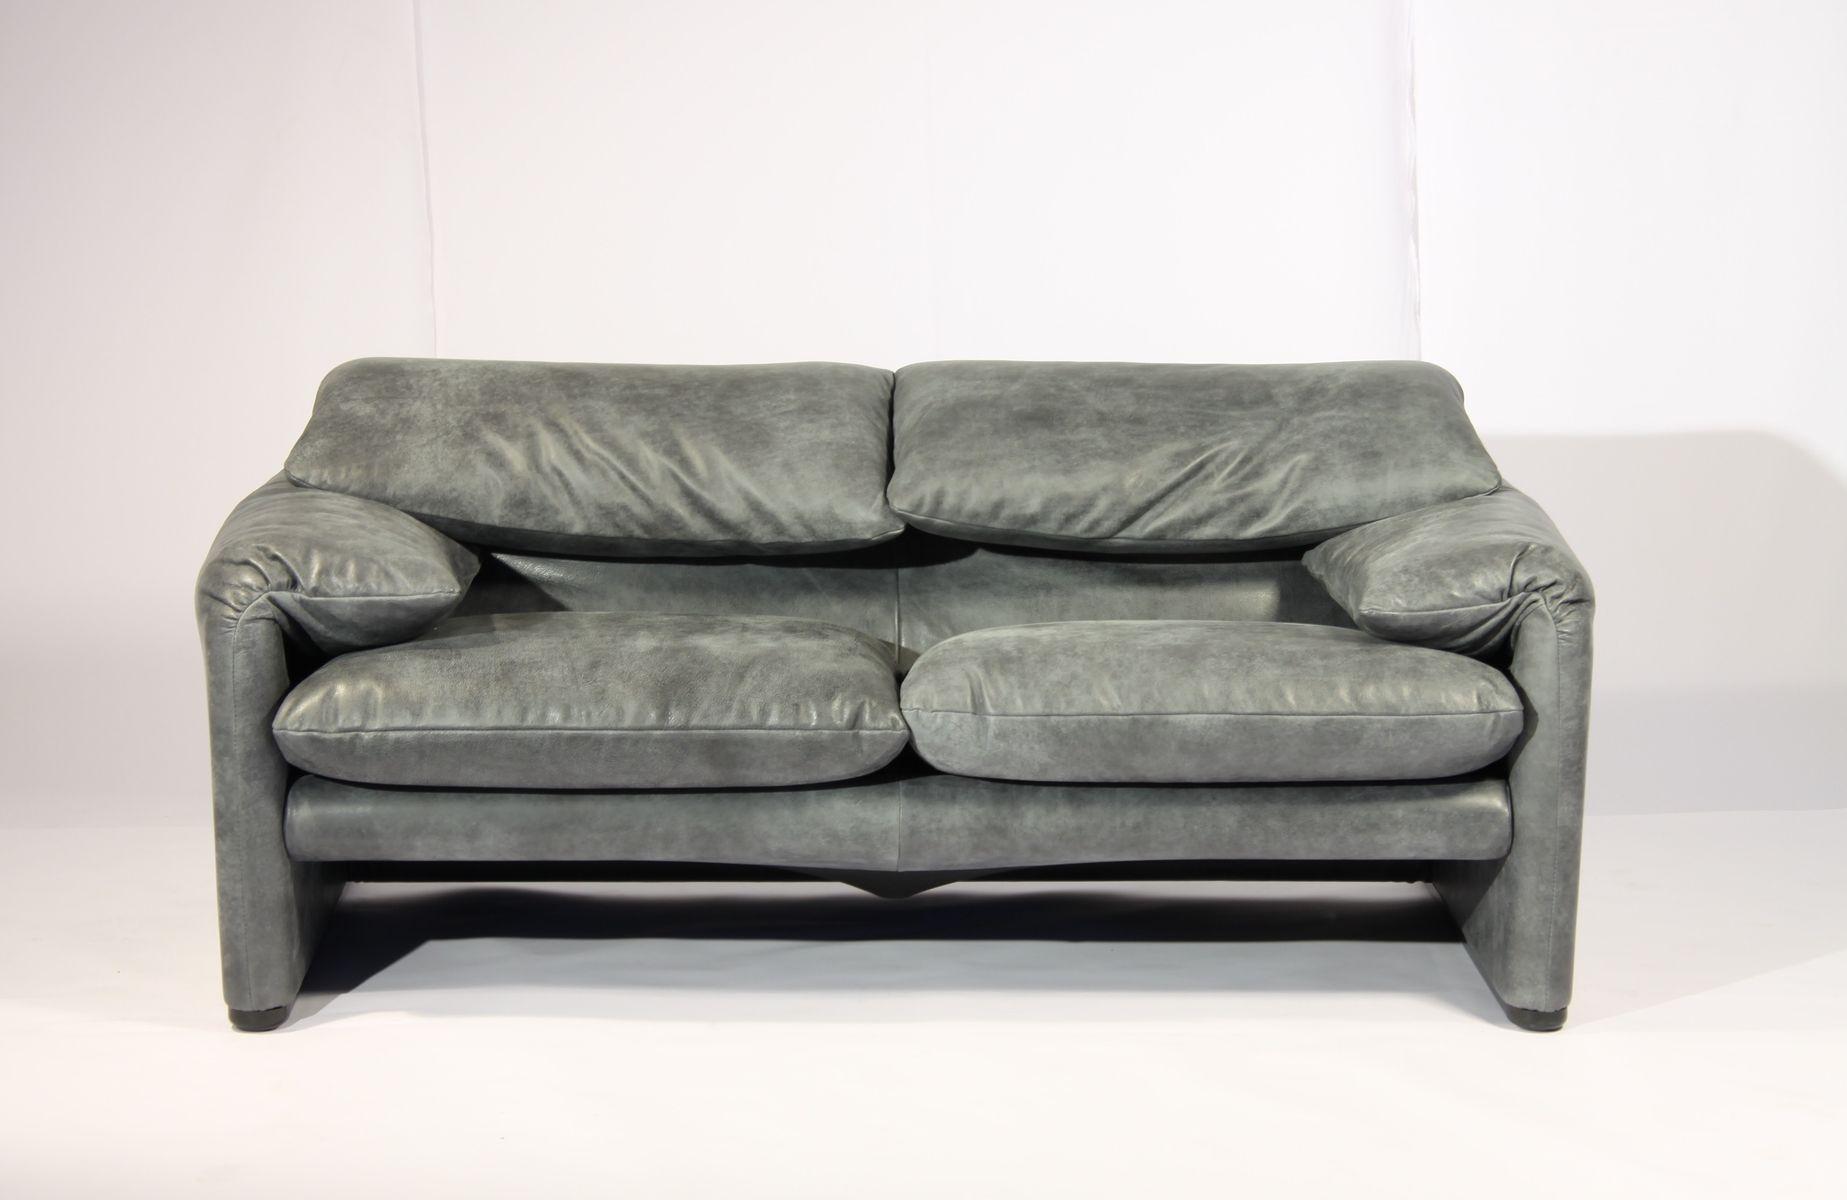 maralunga sofa by vico magistretti for cassina 1974 for. Black Bedroom Furniture Sets. Home Design Ideas